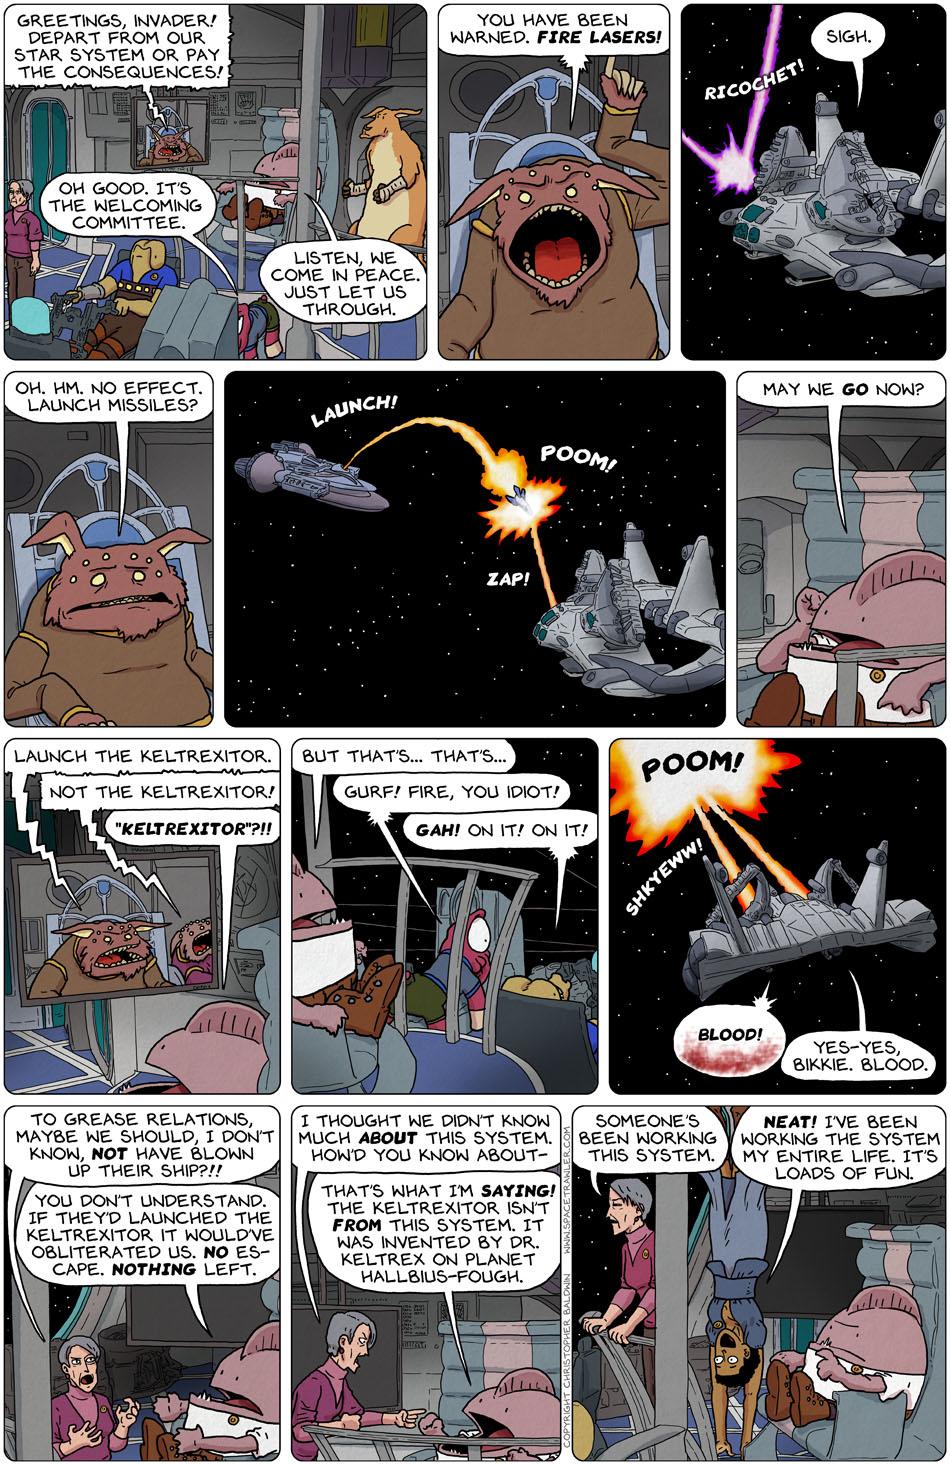 2017-02-22-spacetrawler2